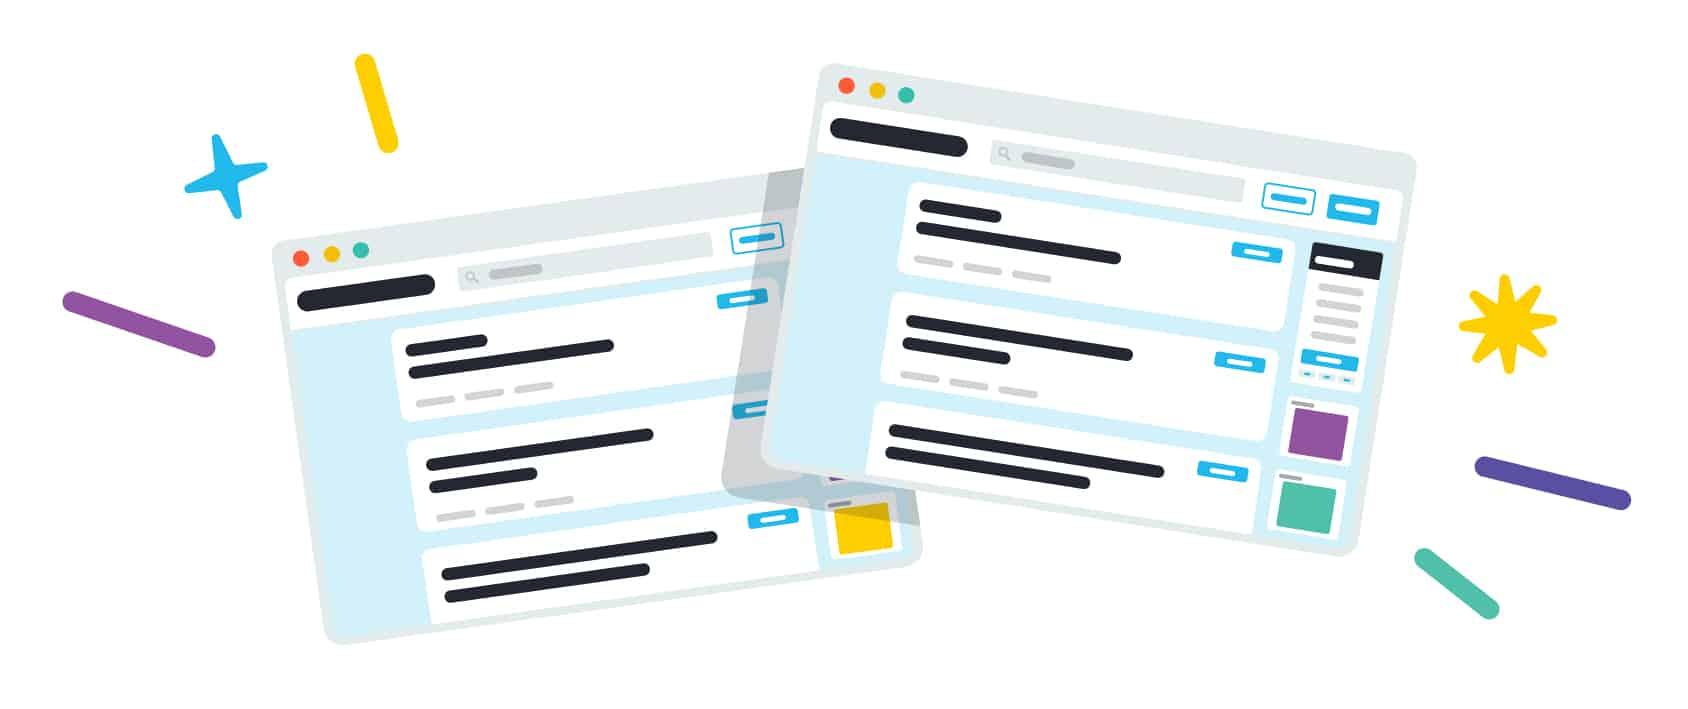 Subreddit Moderator Backlink Method